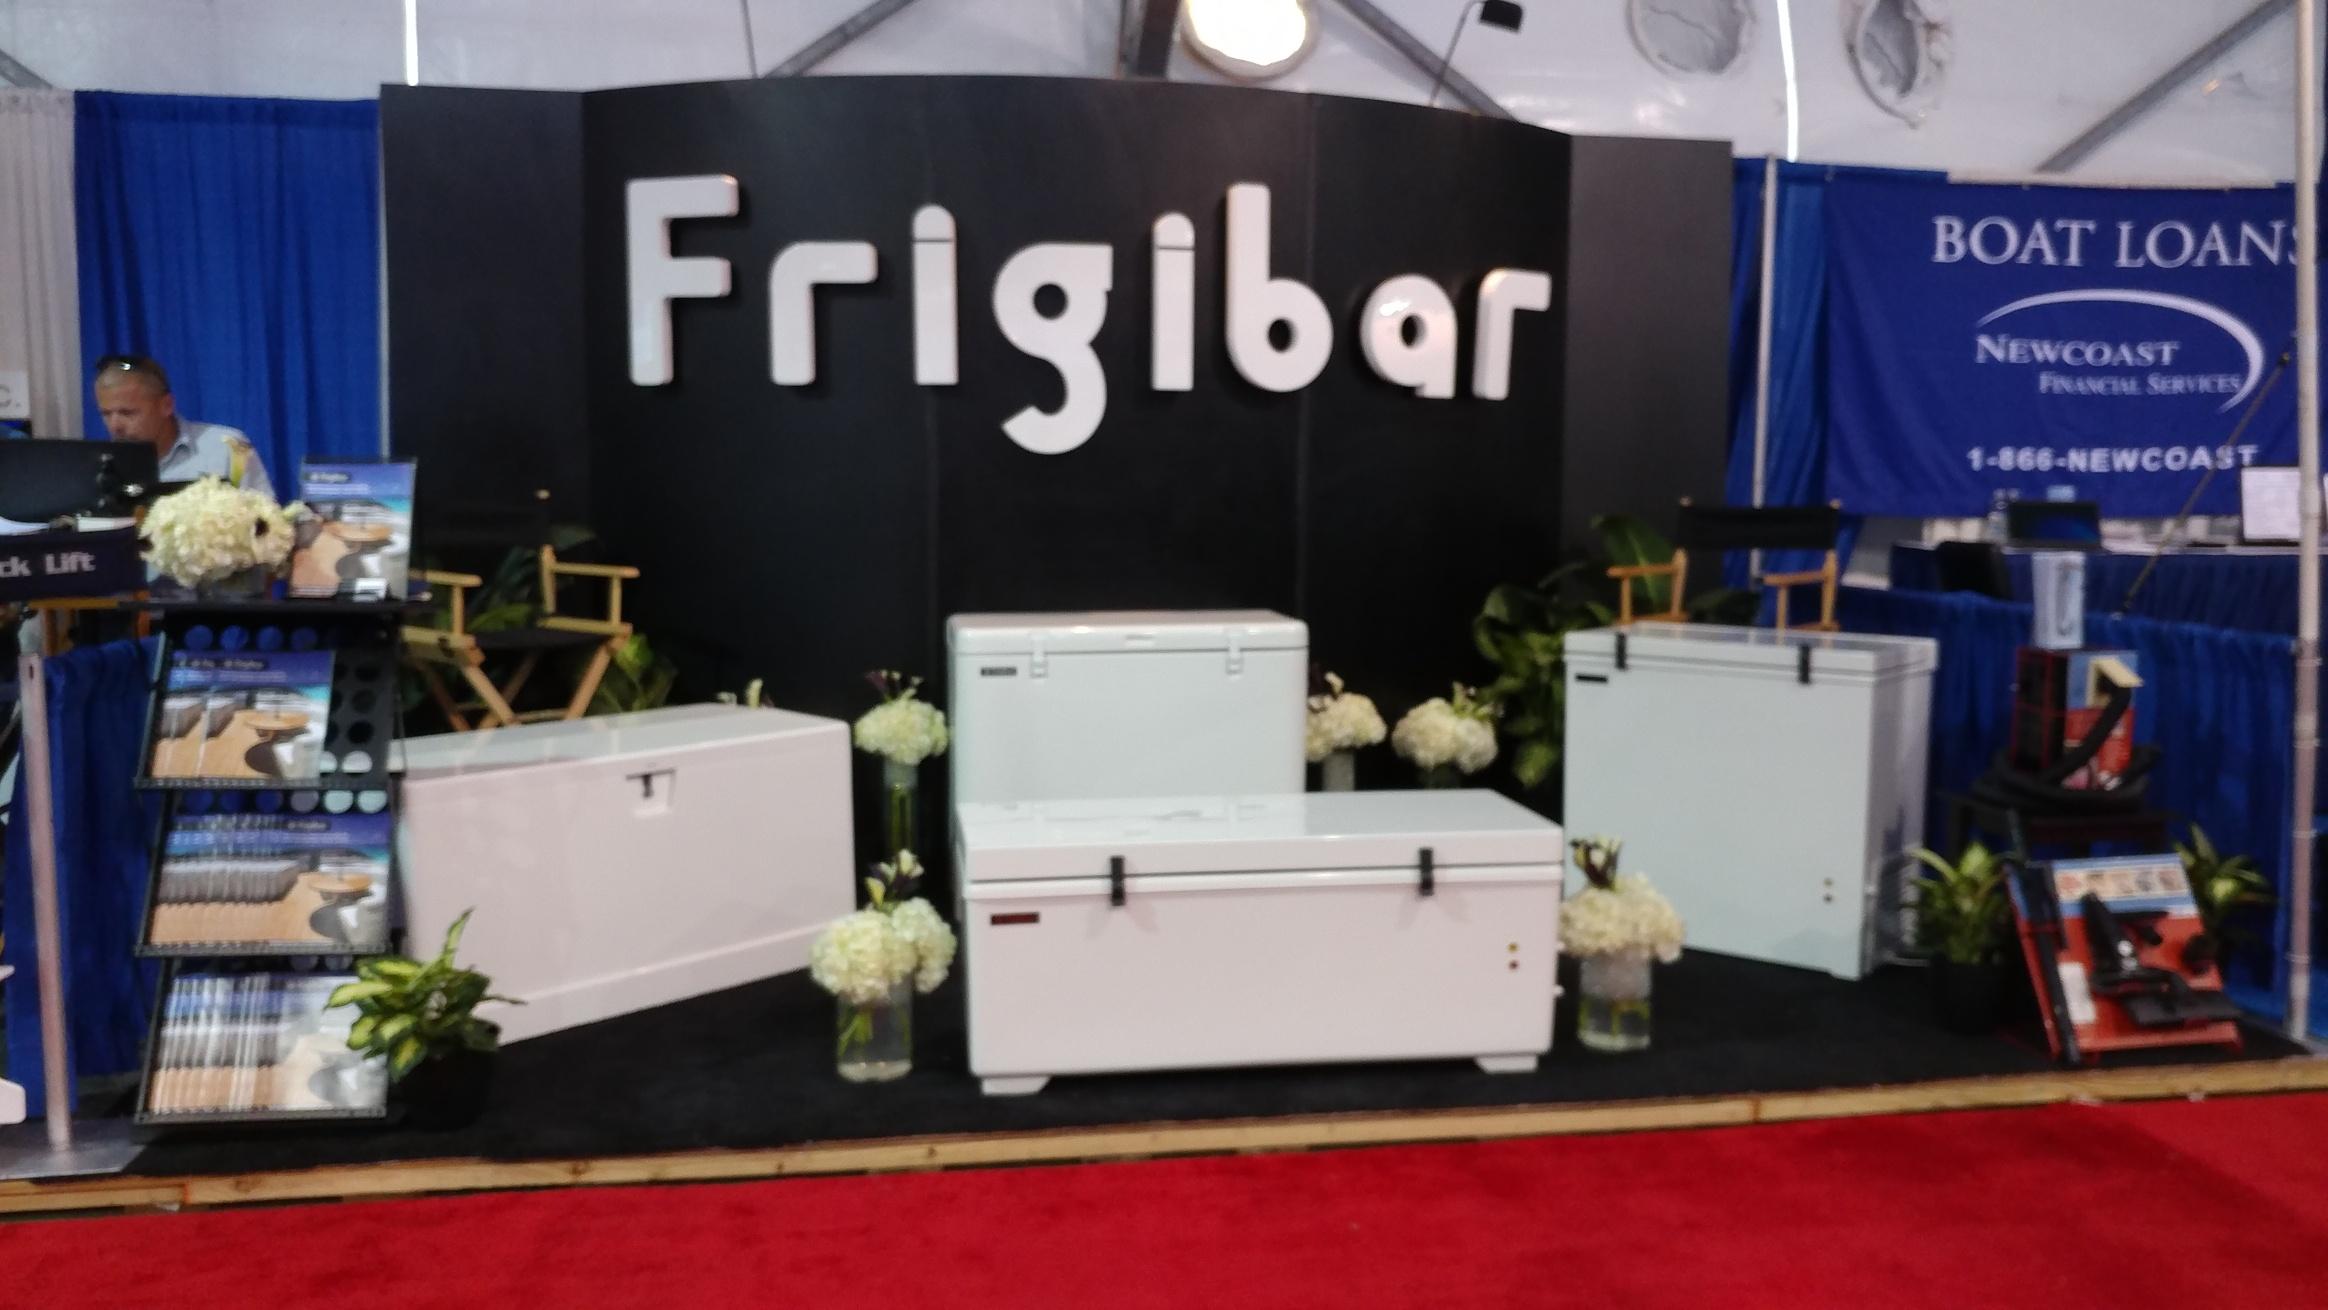 Fort Lauderdale International Boat Show Booth Frigibar